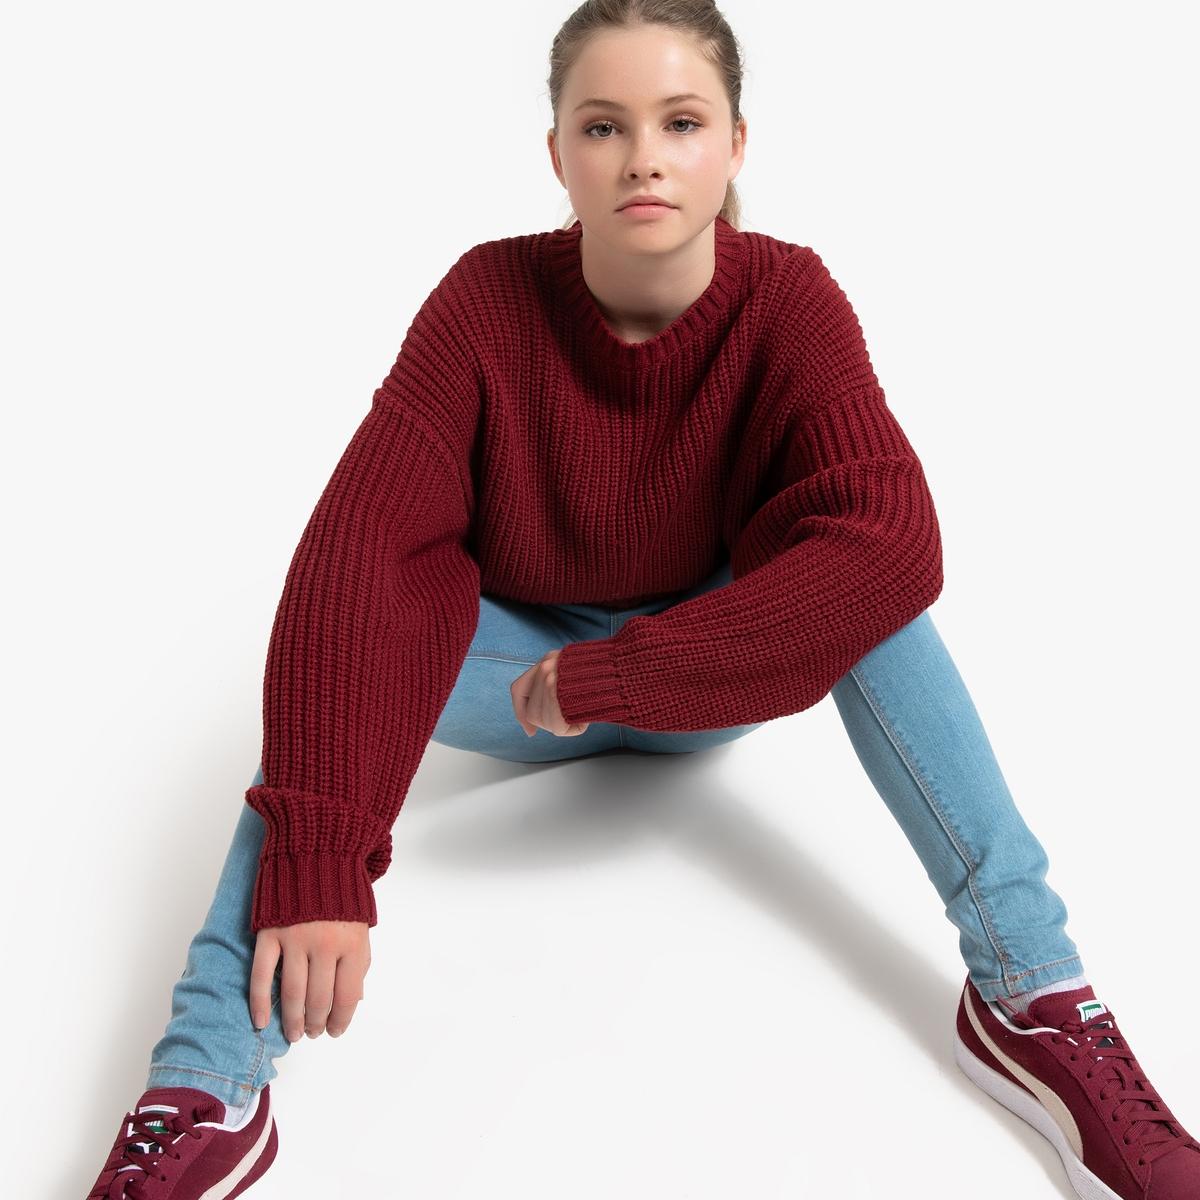 Camisola curta modelo loose, 10-18 anos